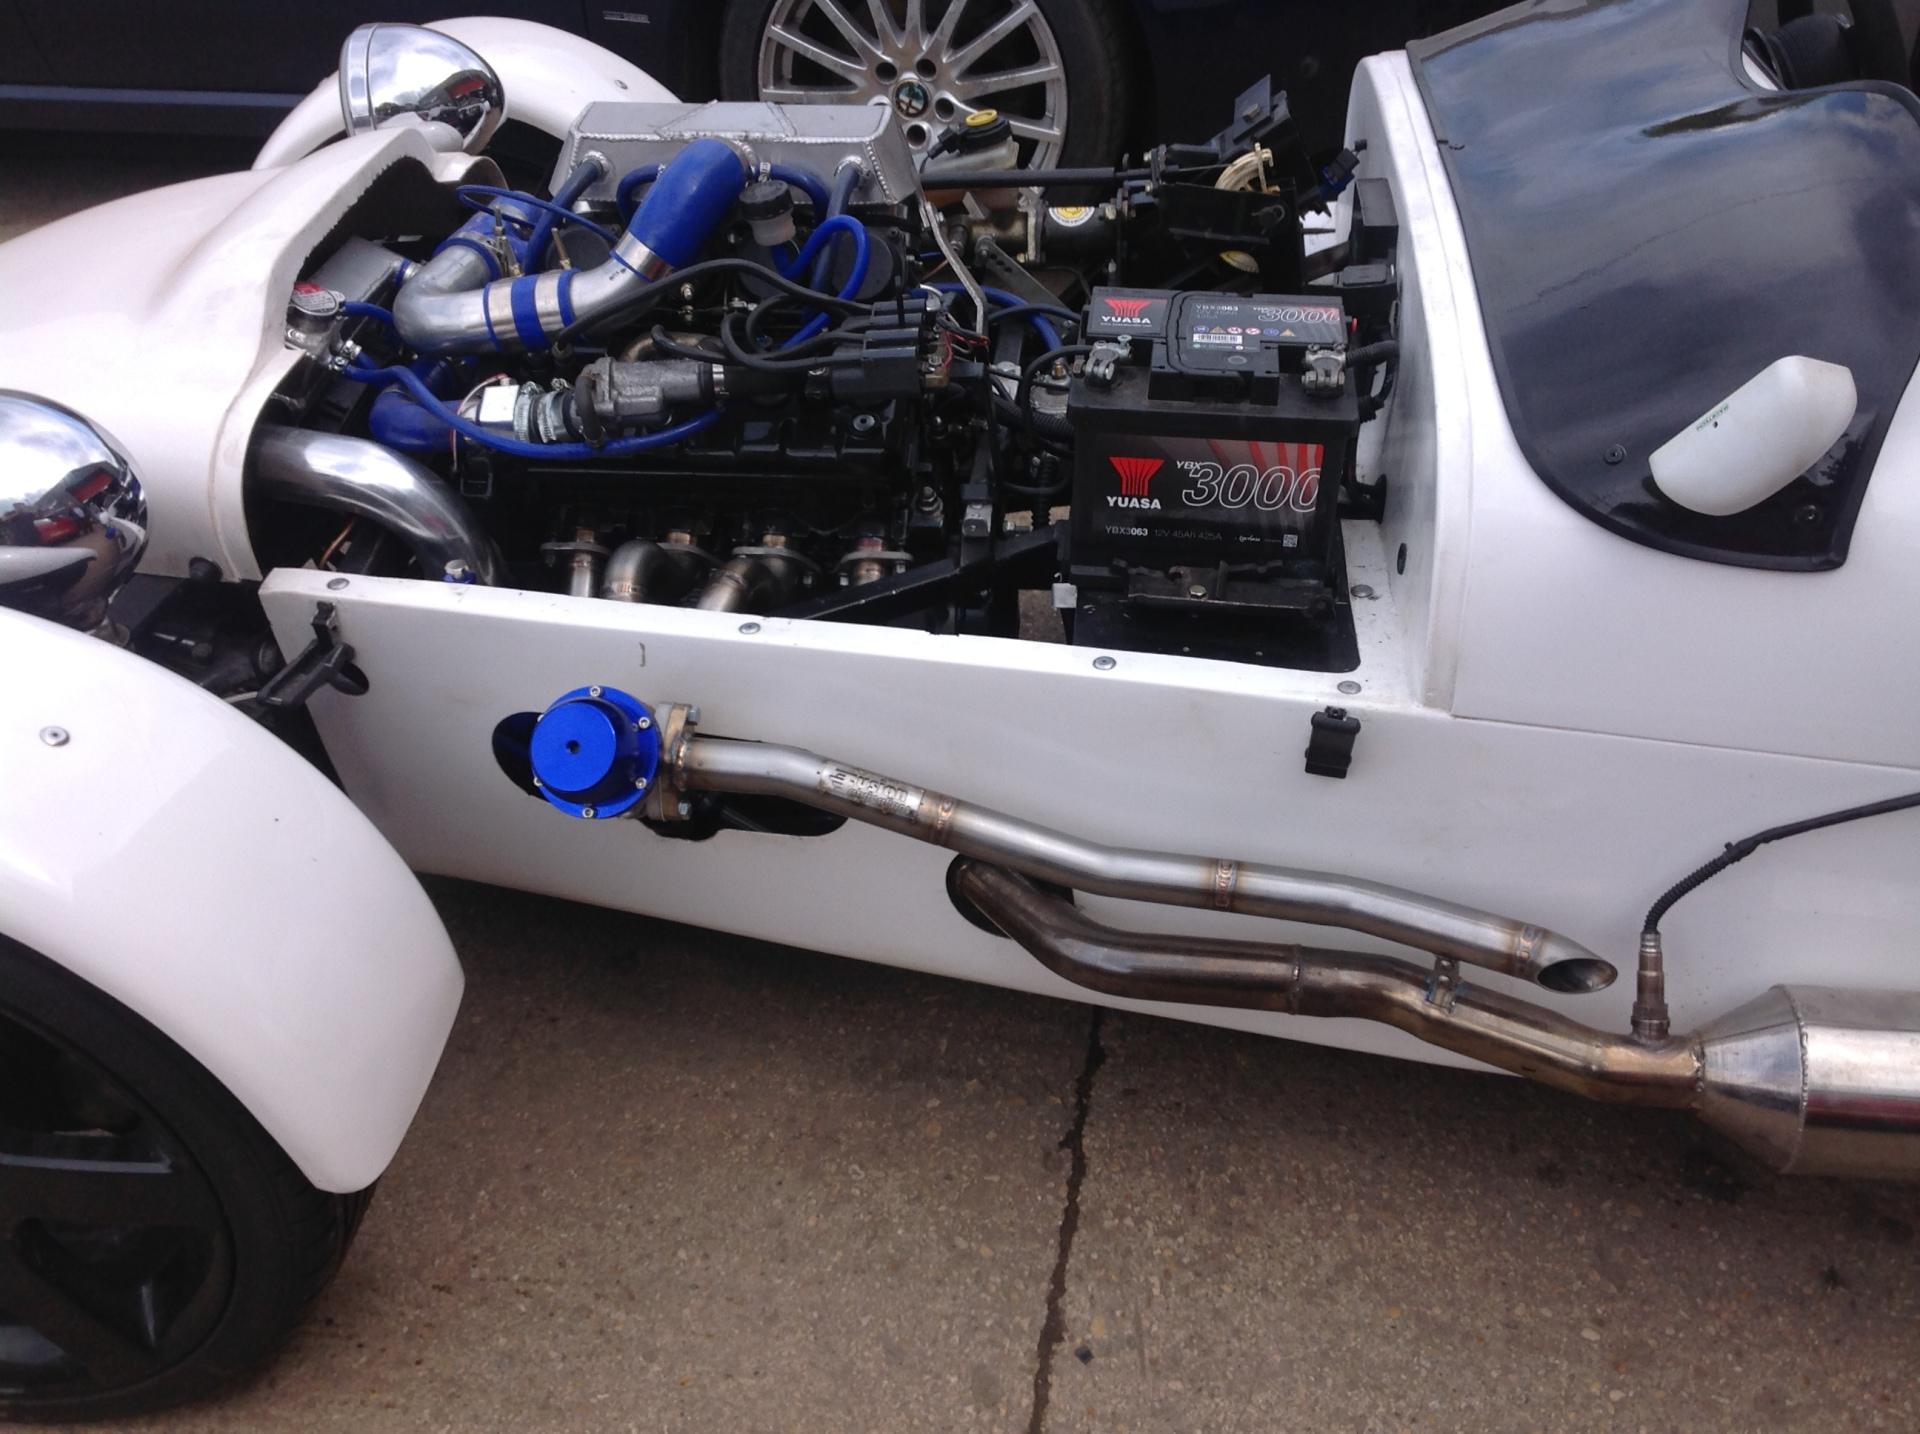 Tiger kit car turbo bike engine